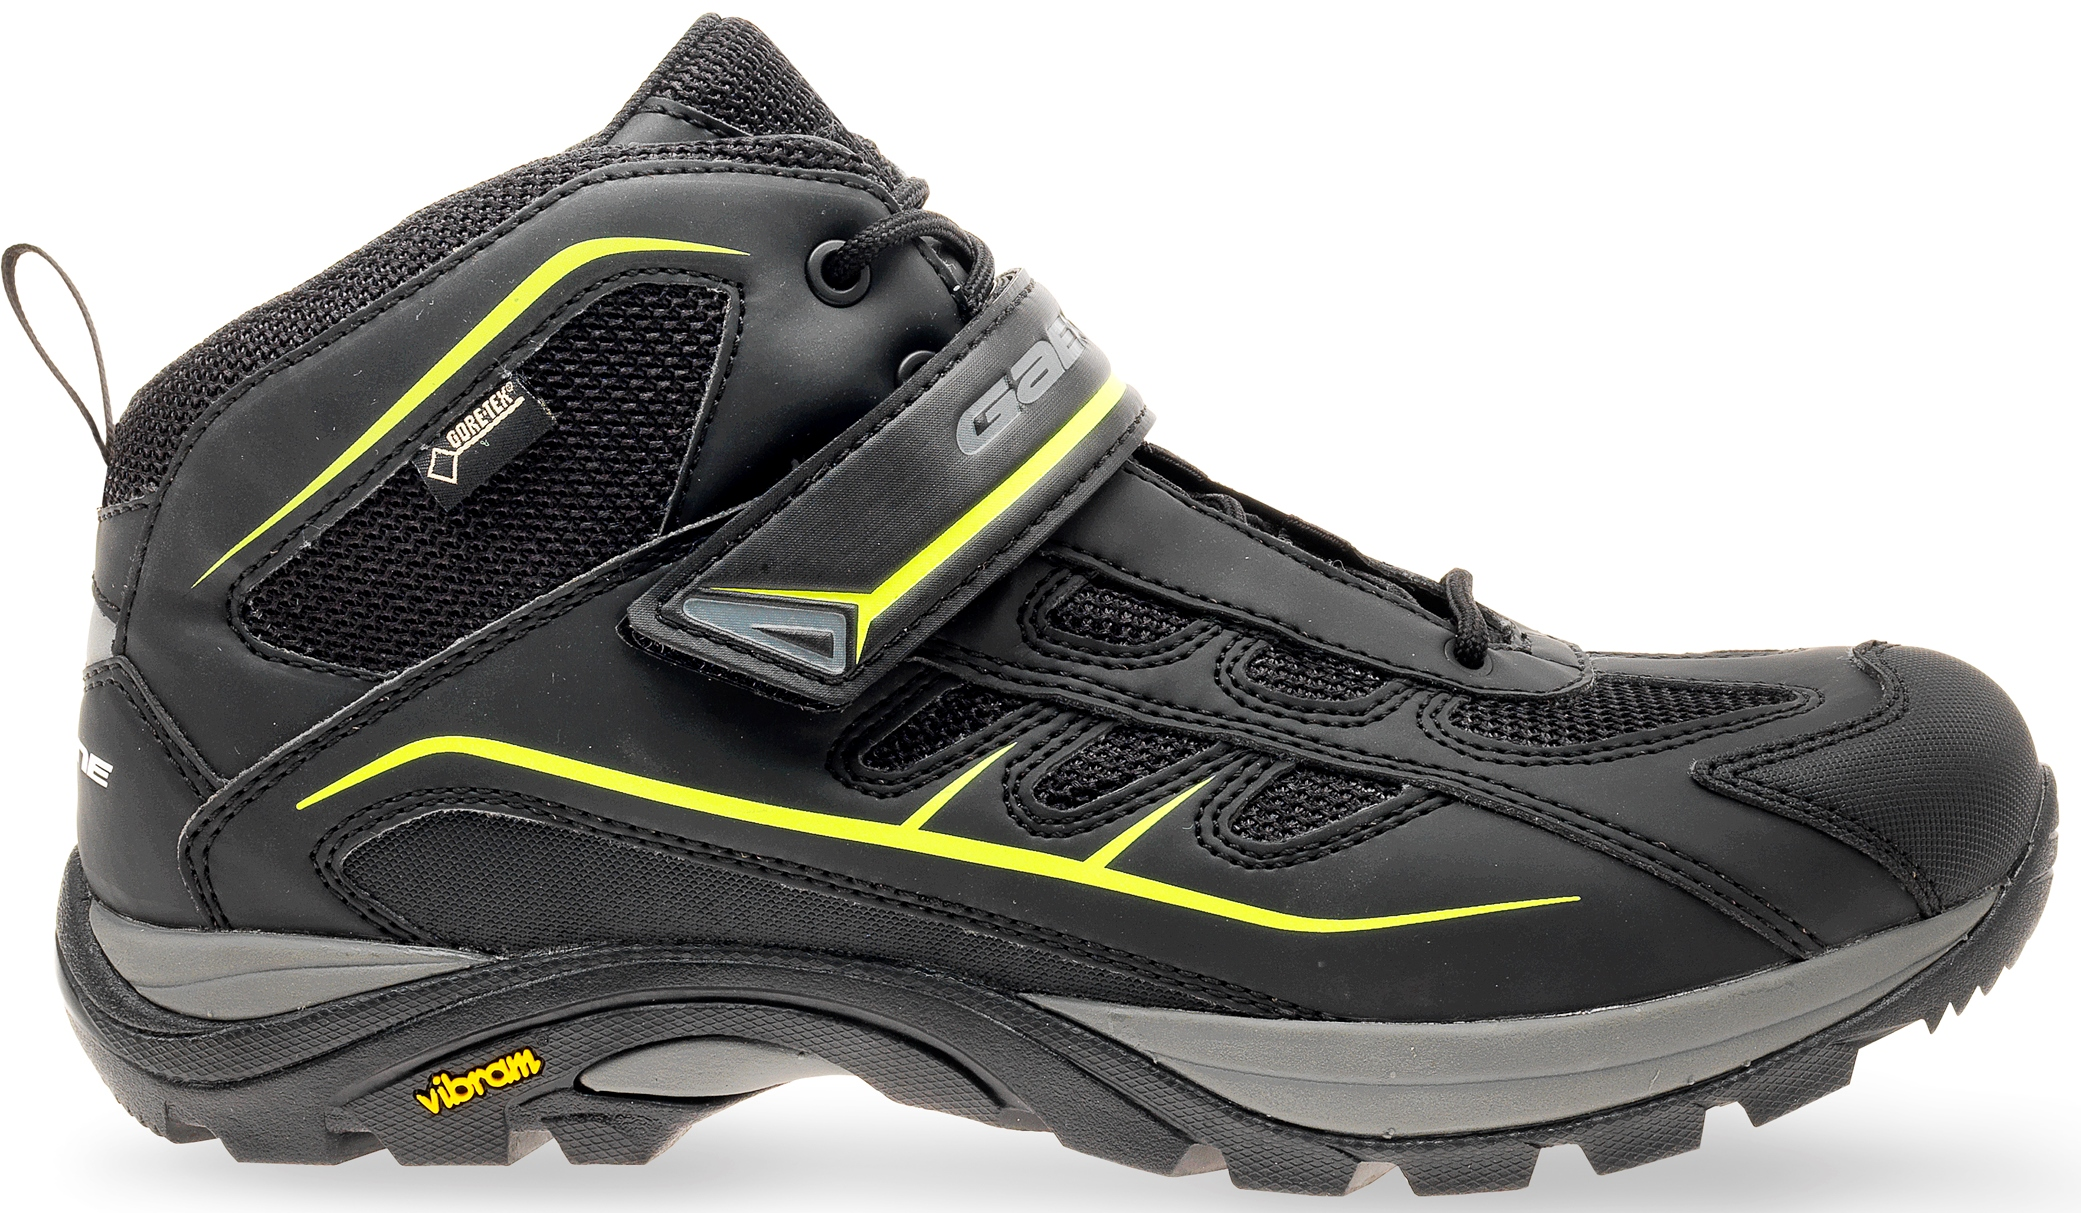 TerrainG Gore mid Black All Shoes Tex GaerneCycling c3Ajq5RL4